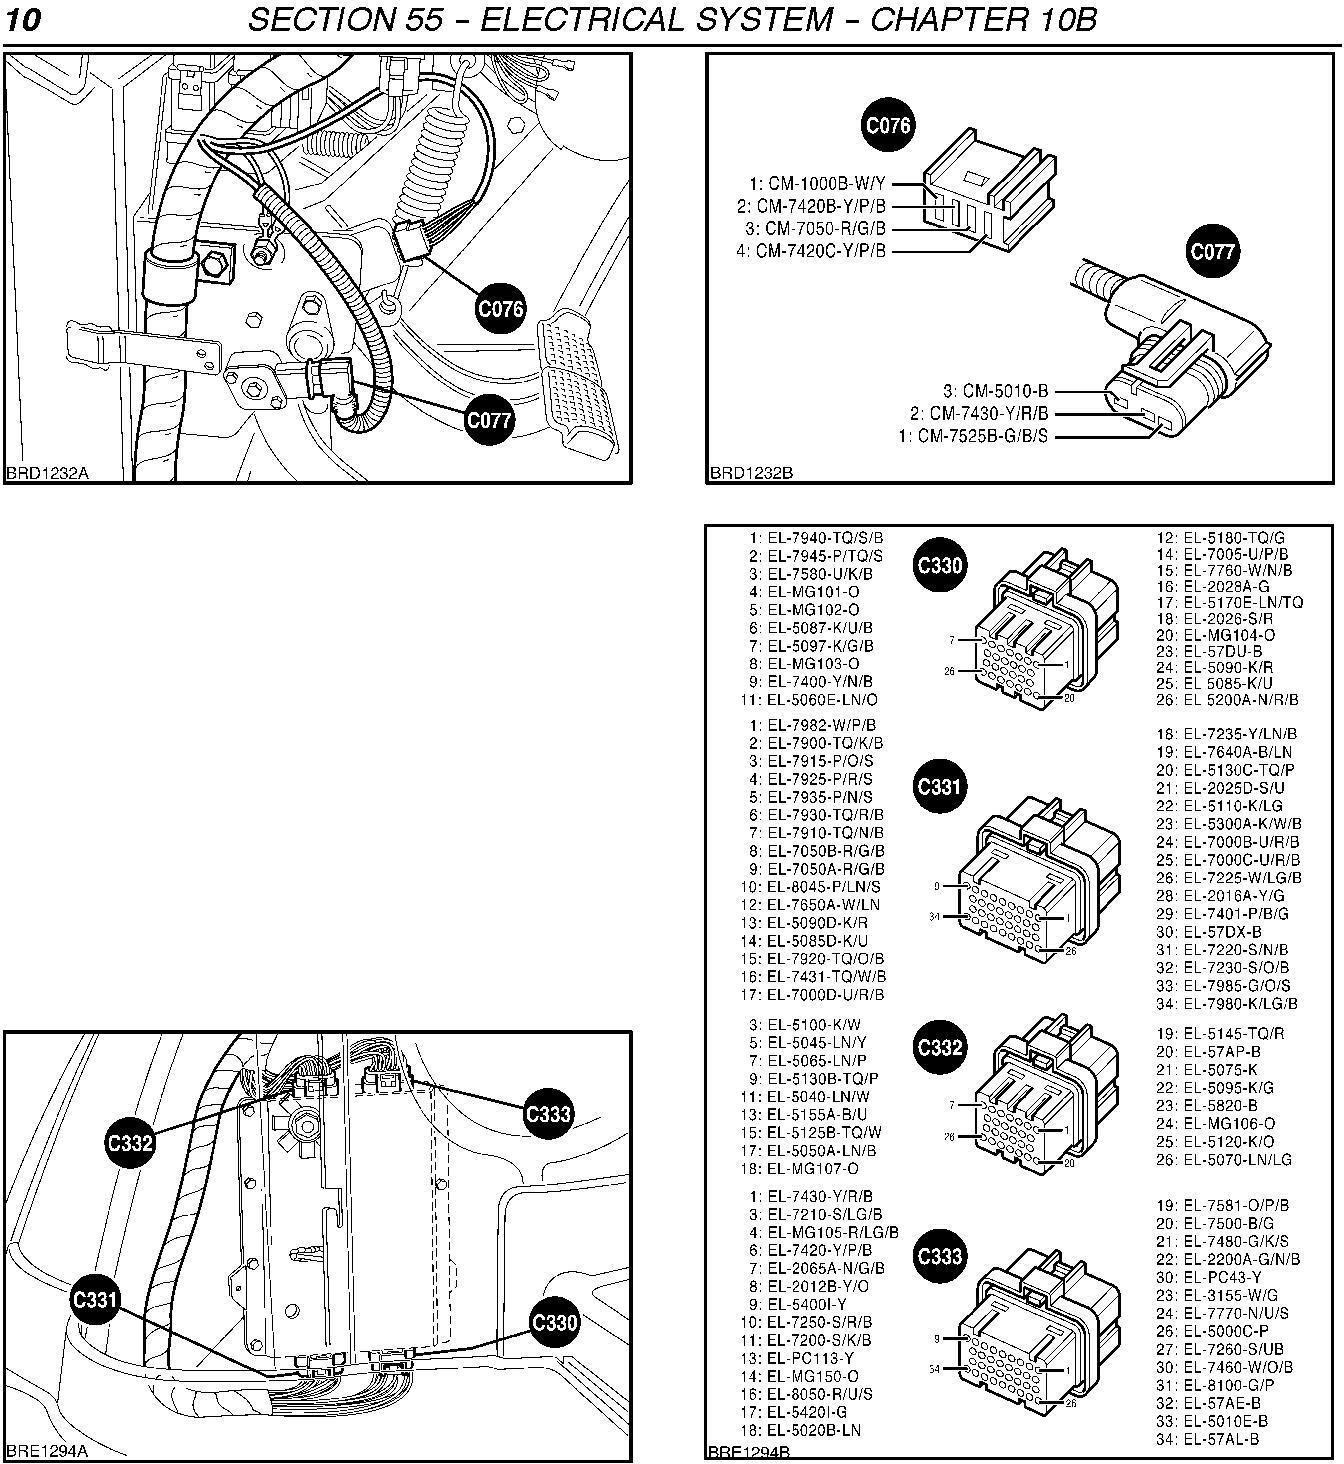 New Holland TM120/125/130/140/150/155, TM175-TM190 Tractor Fault Codes Diagnostic Service Manual - 1